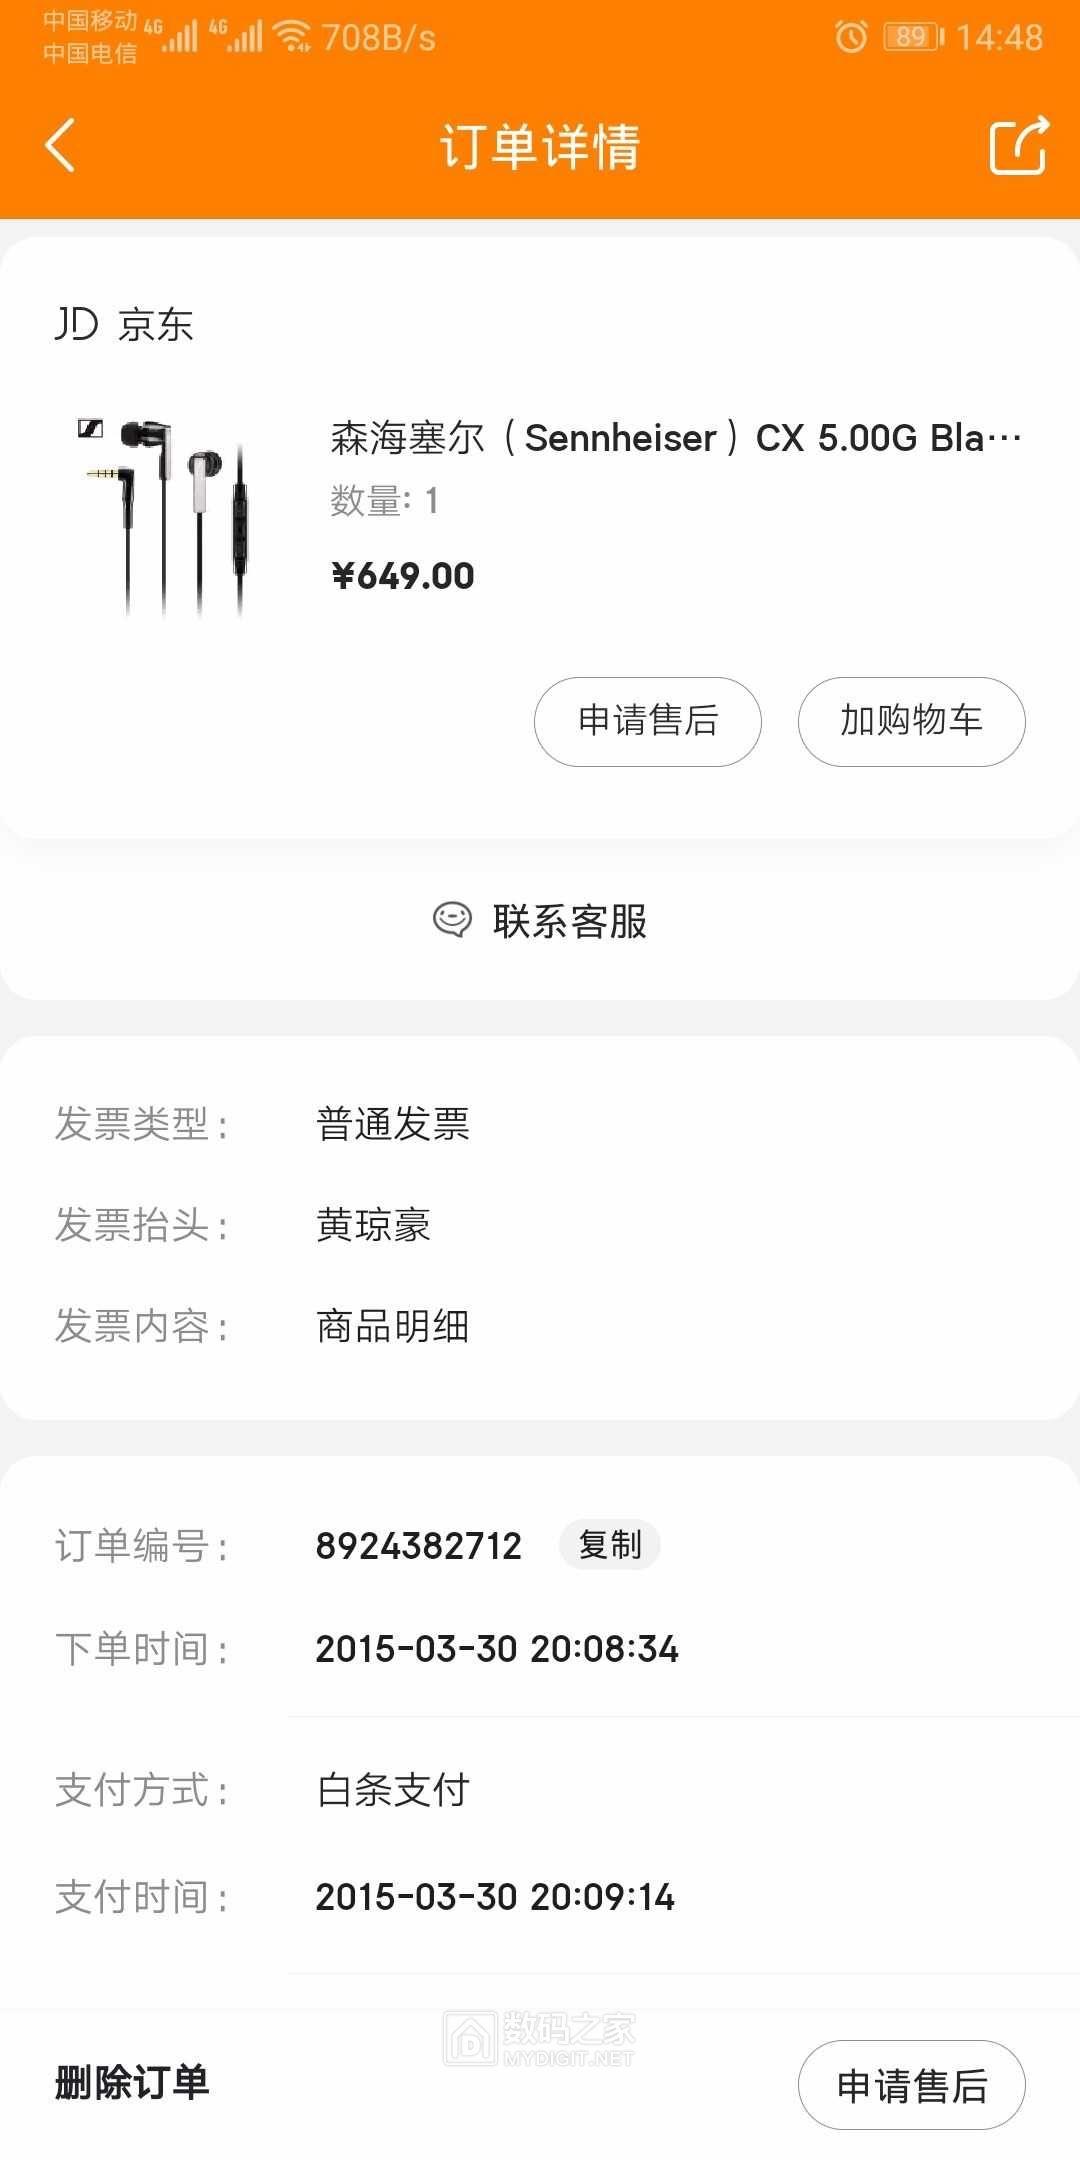 Screenshot_20190611_144845_com.jingdong.app.mall.jpg